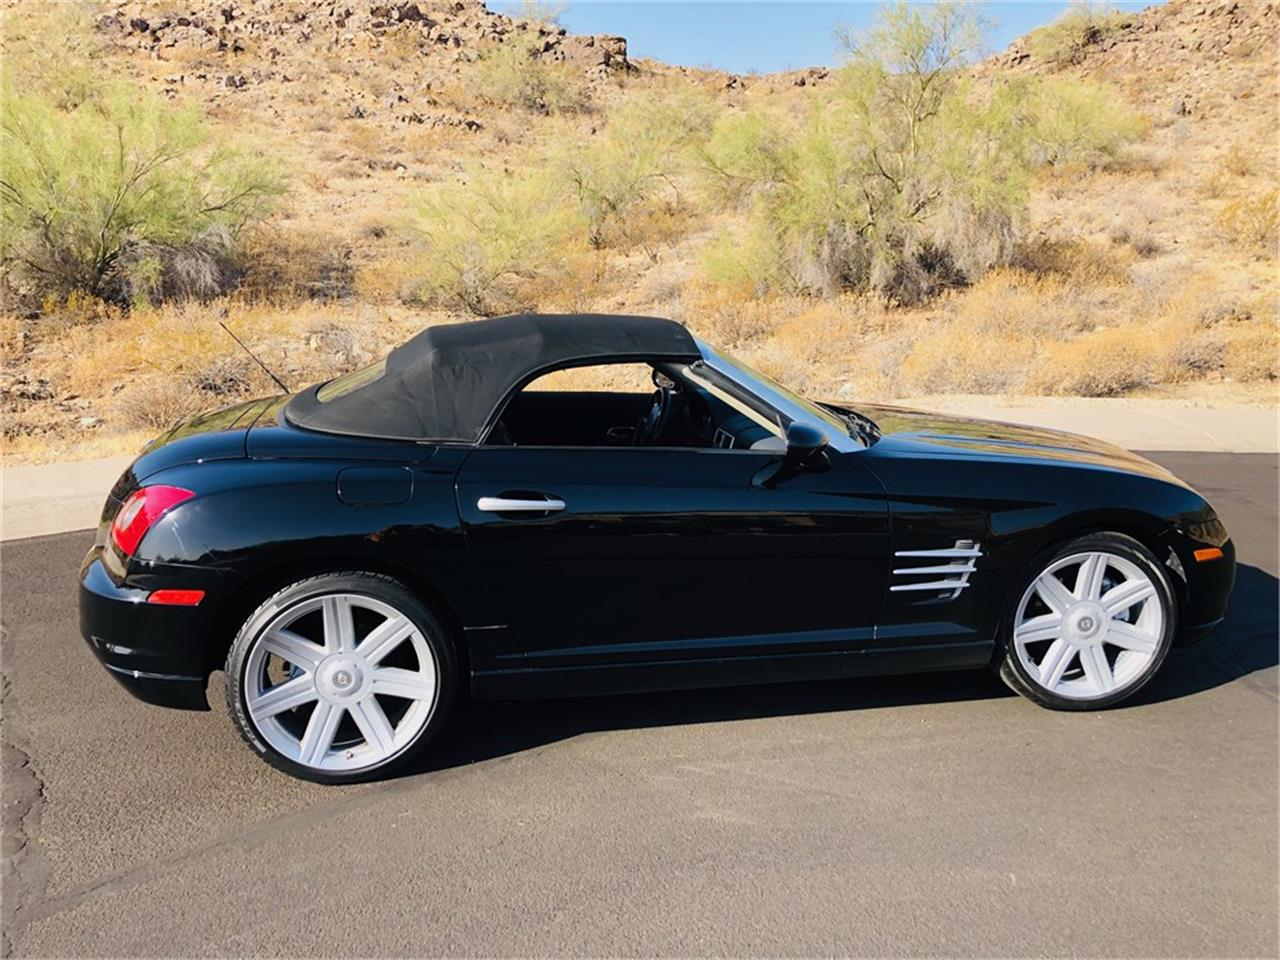 2005 Chrysler Crossfire (CC-1410203) for sale in Phoenix, Arizona